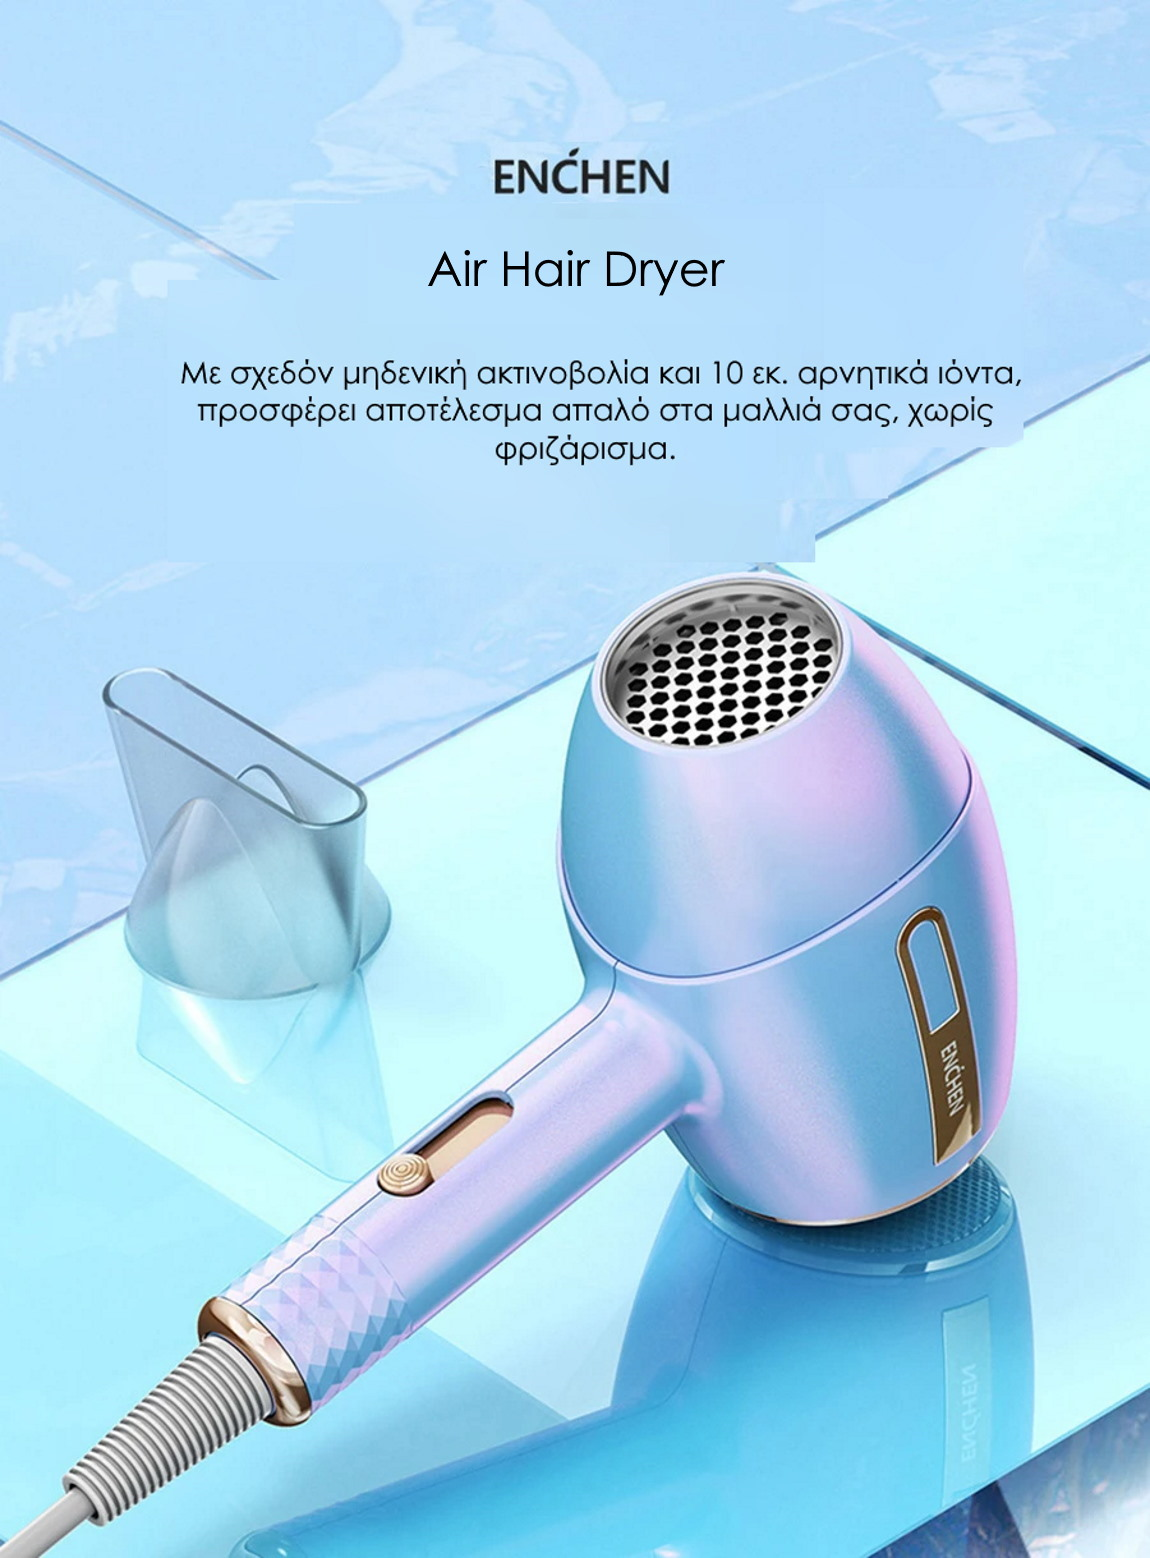 Enchen Air Hair Dryer